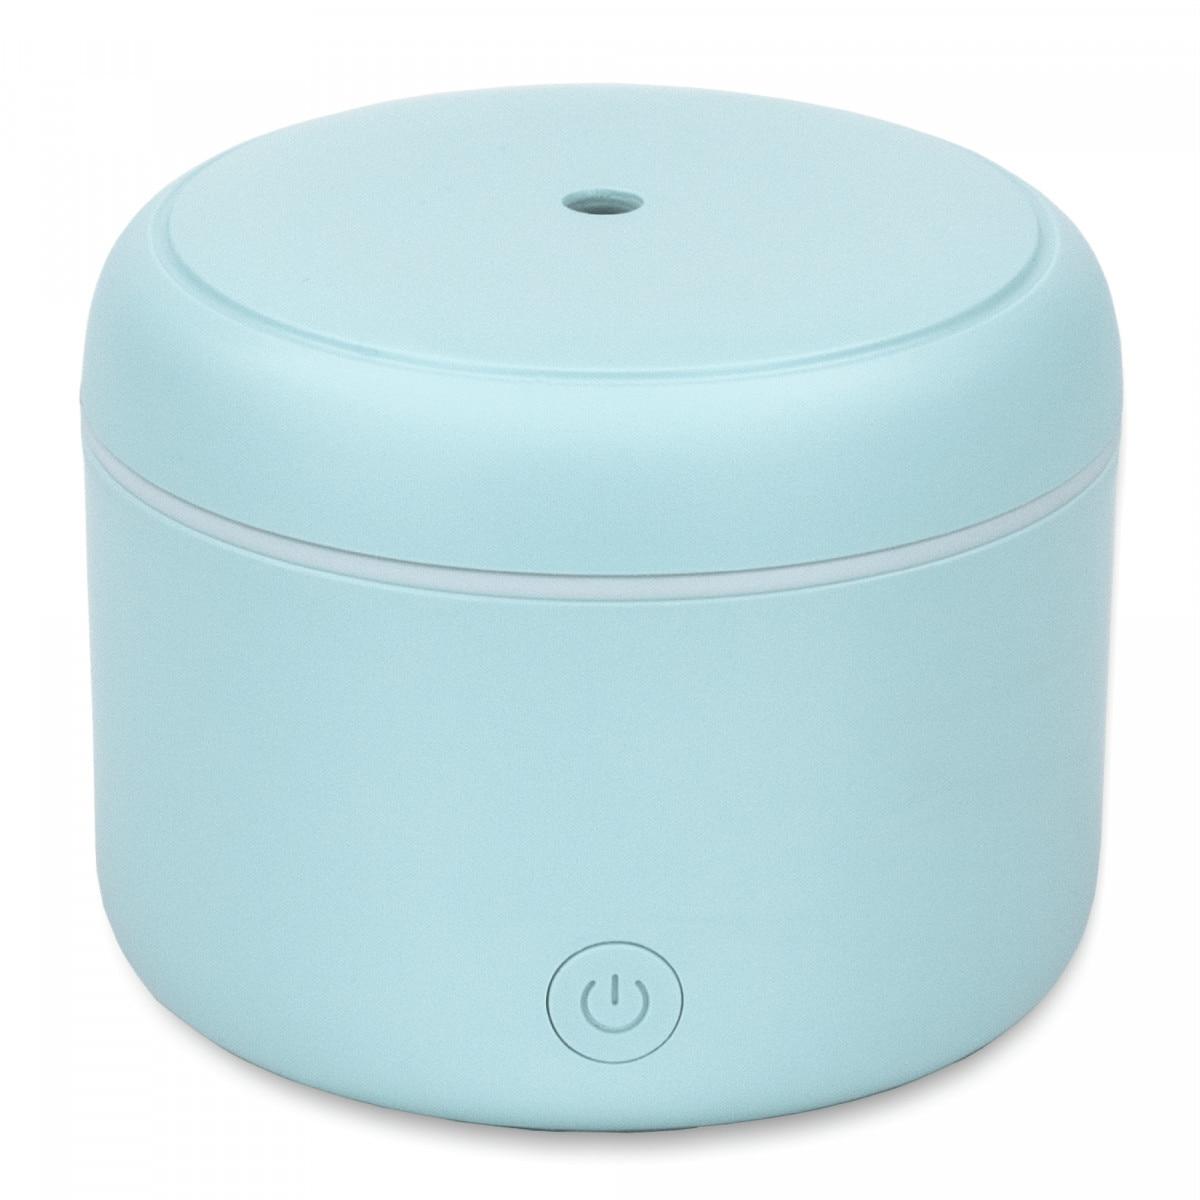 Fotografie Difuzor de Aroma cu Ultrasunete Turbionaire Puck Aqua, 7 Lumini LED interschimbabile, 5 W, Silentios, Portabil, Posibilitate alimentare USB, Oprire automata